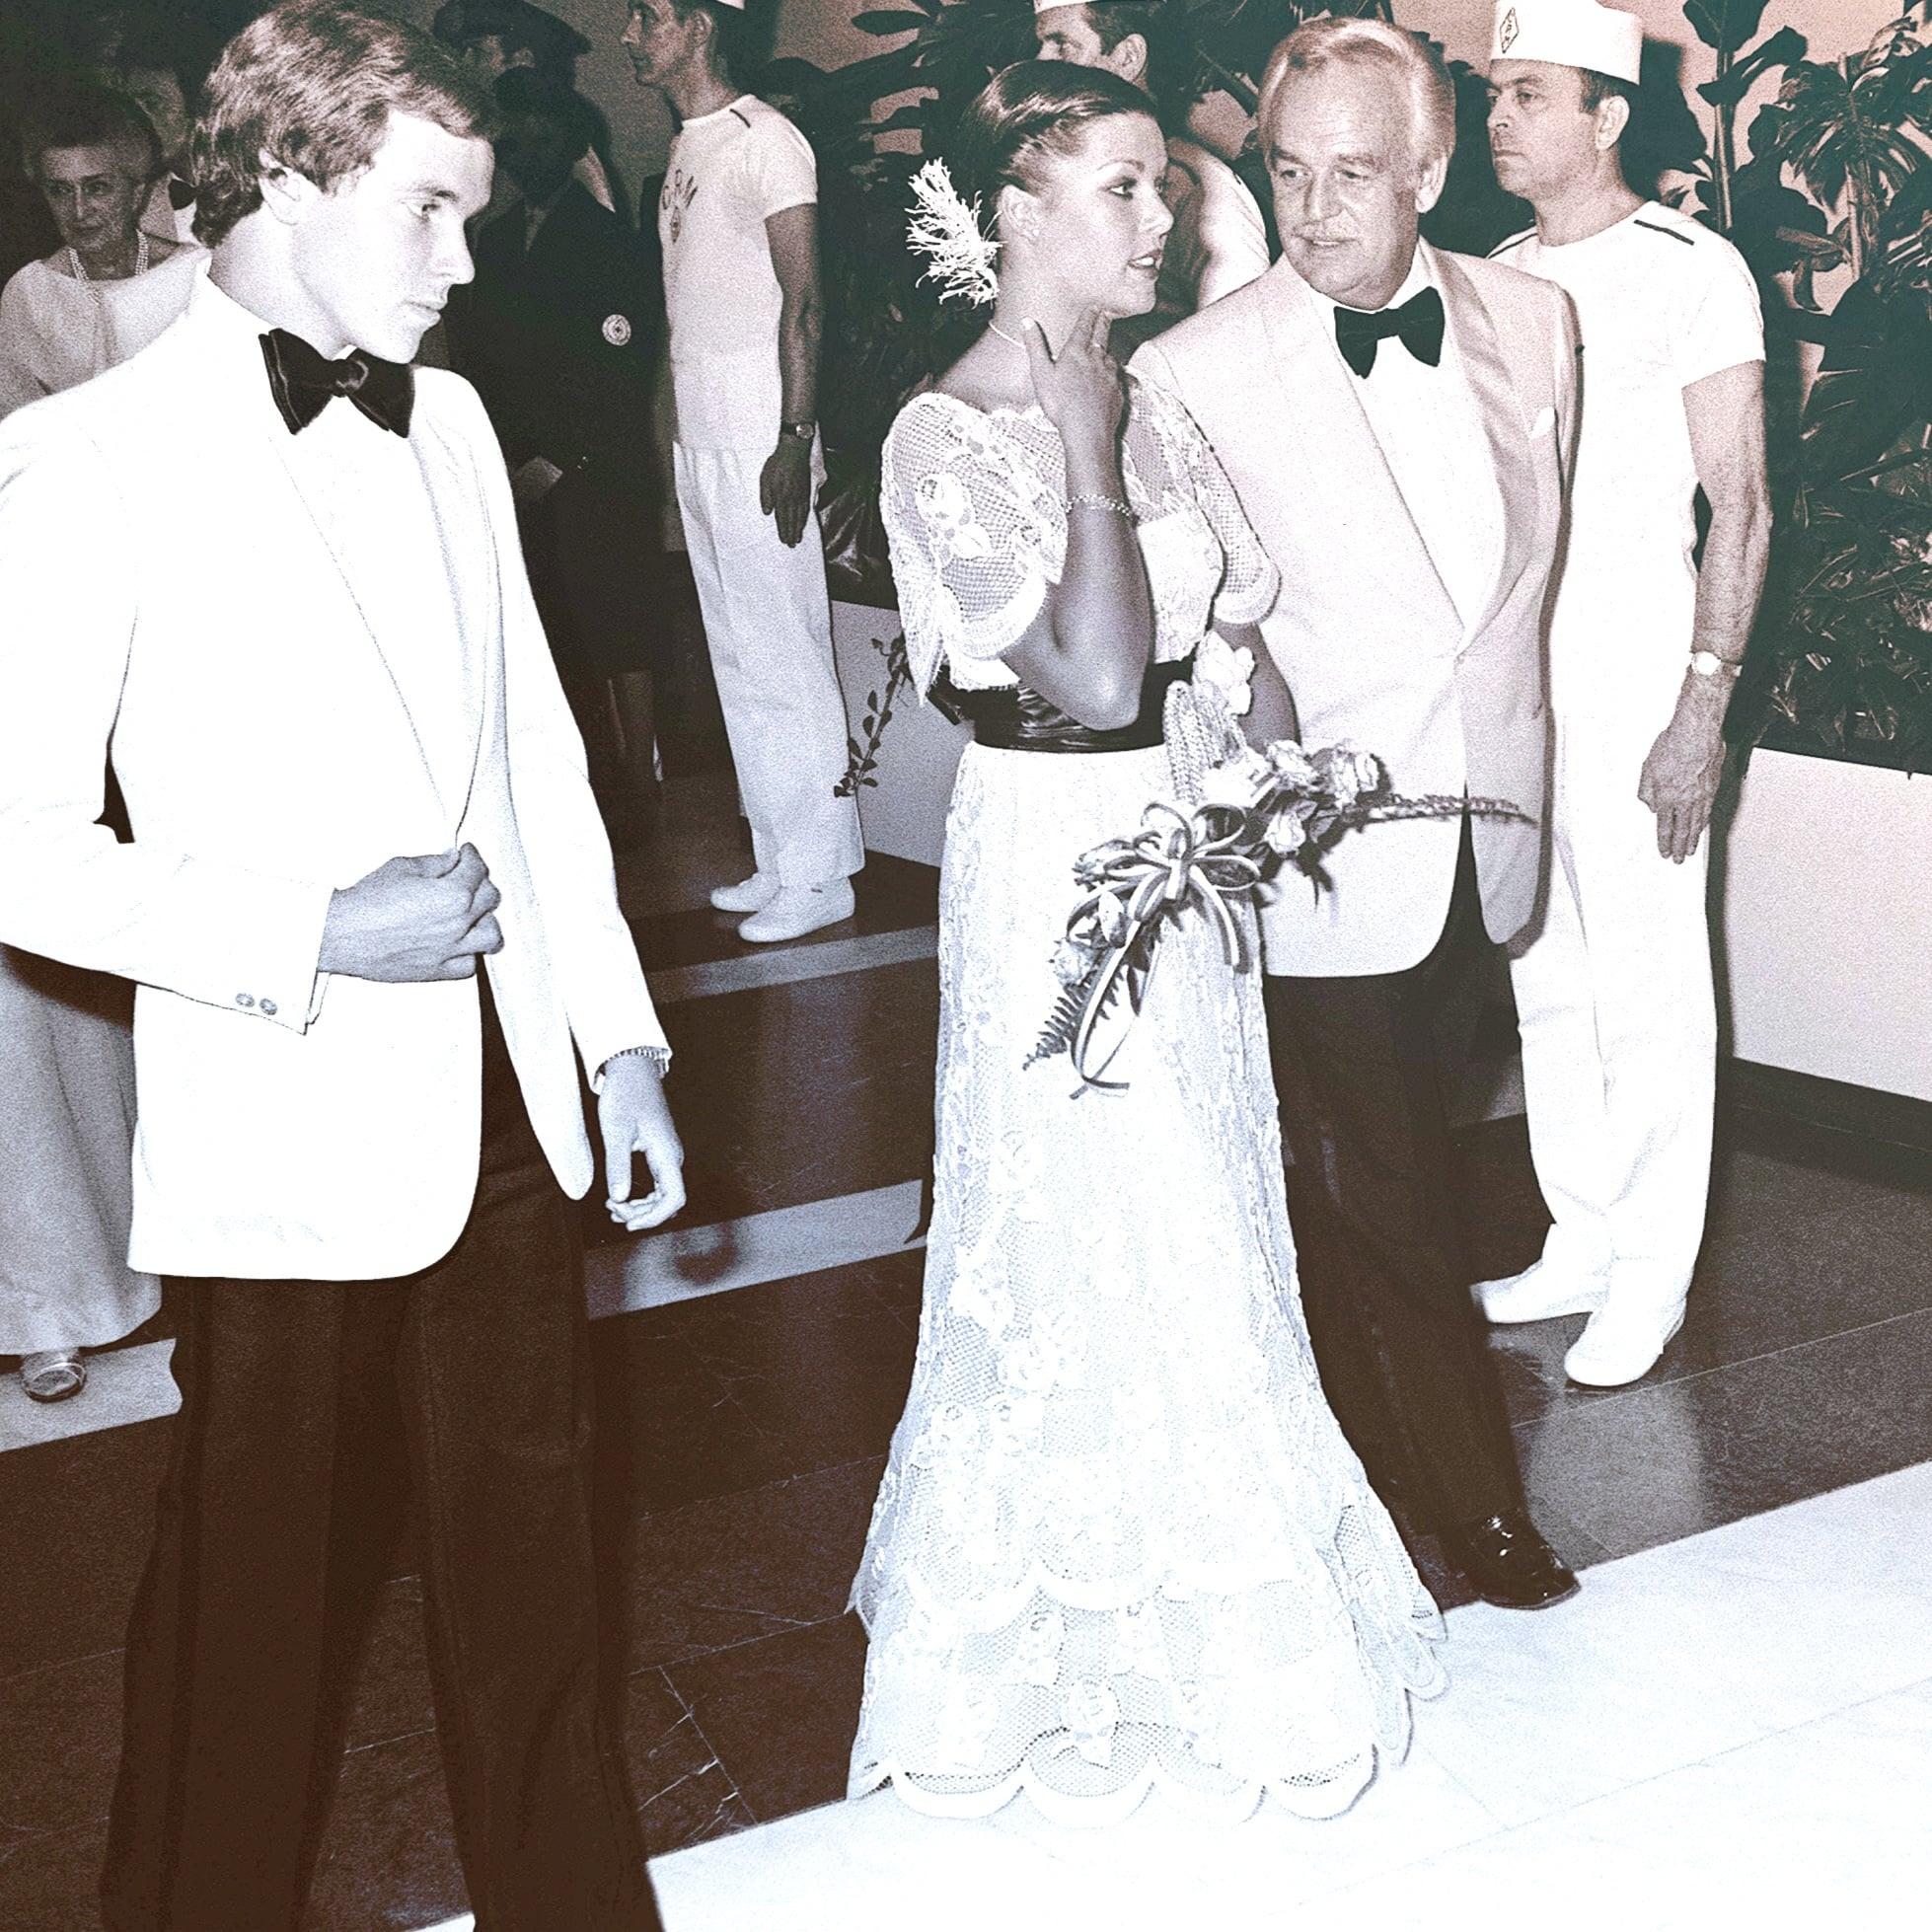 Prince Albert, Princess Caroline, and Prince Rainier at the Red Cross Ball in 1976